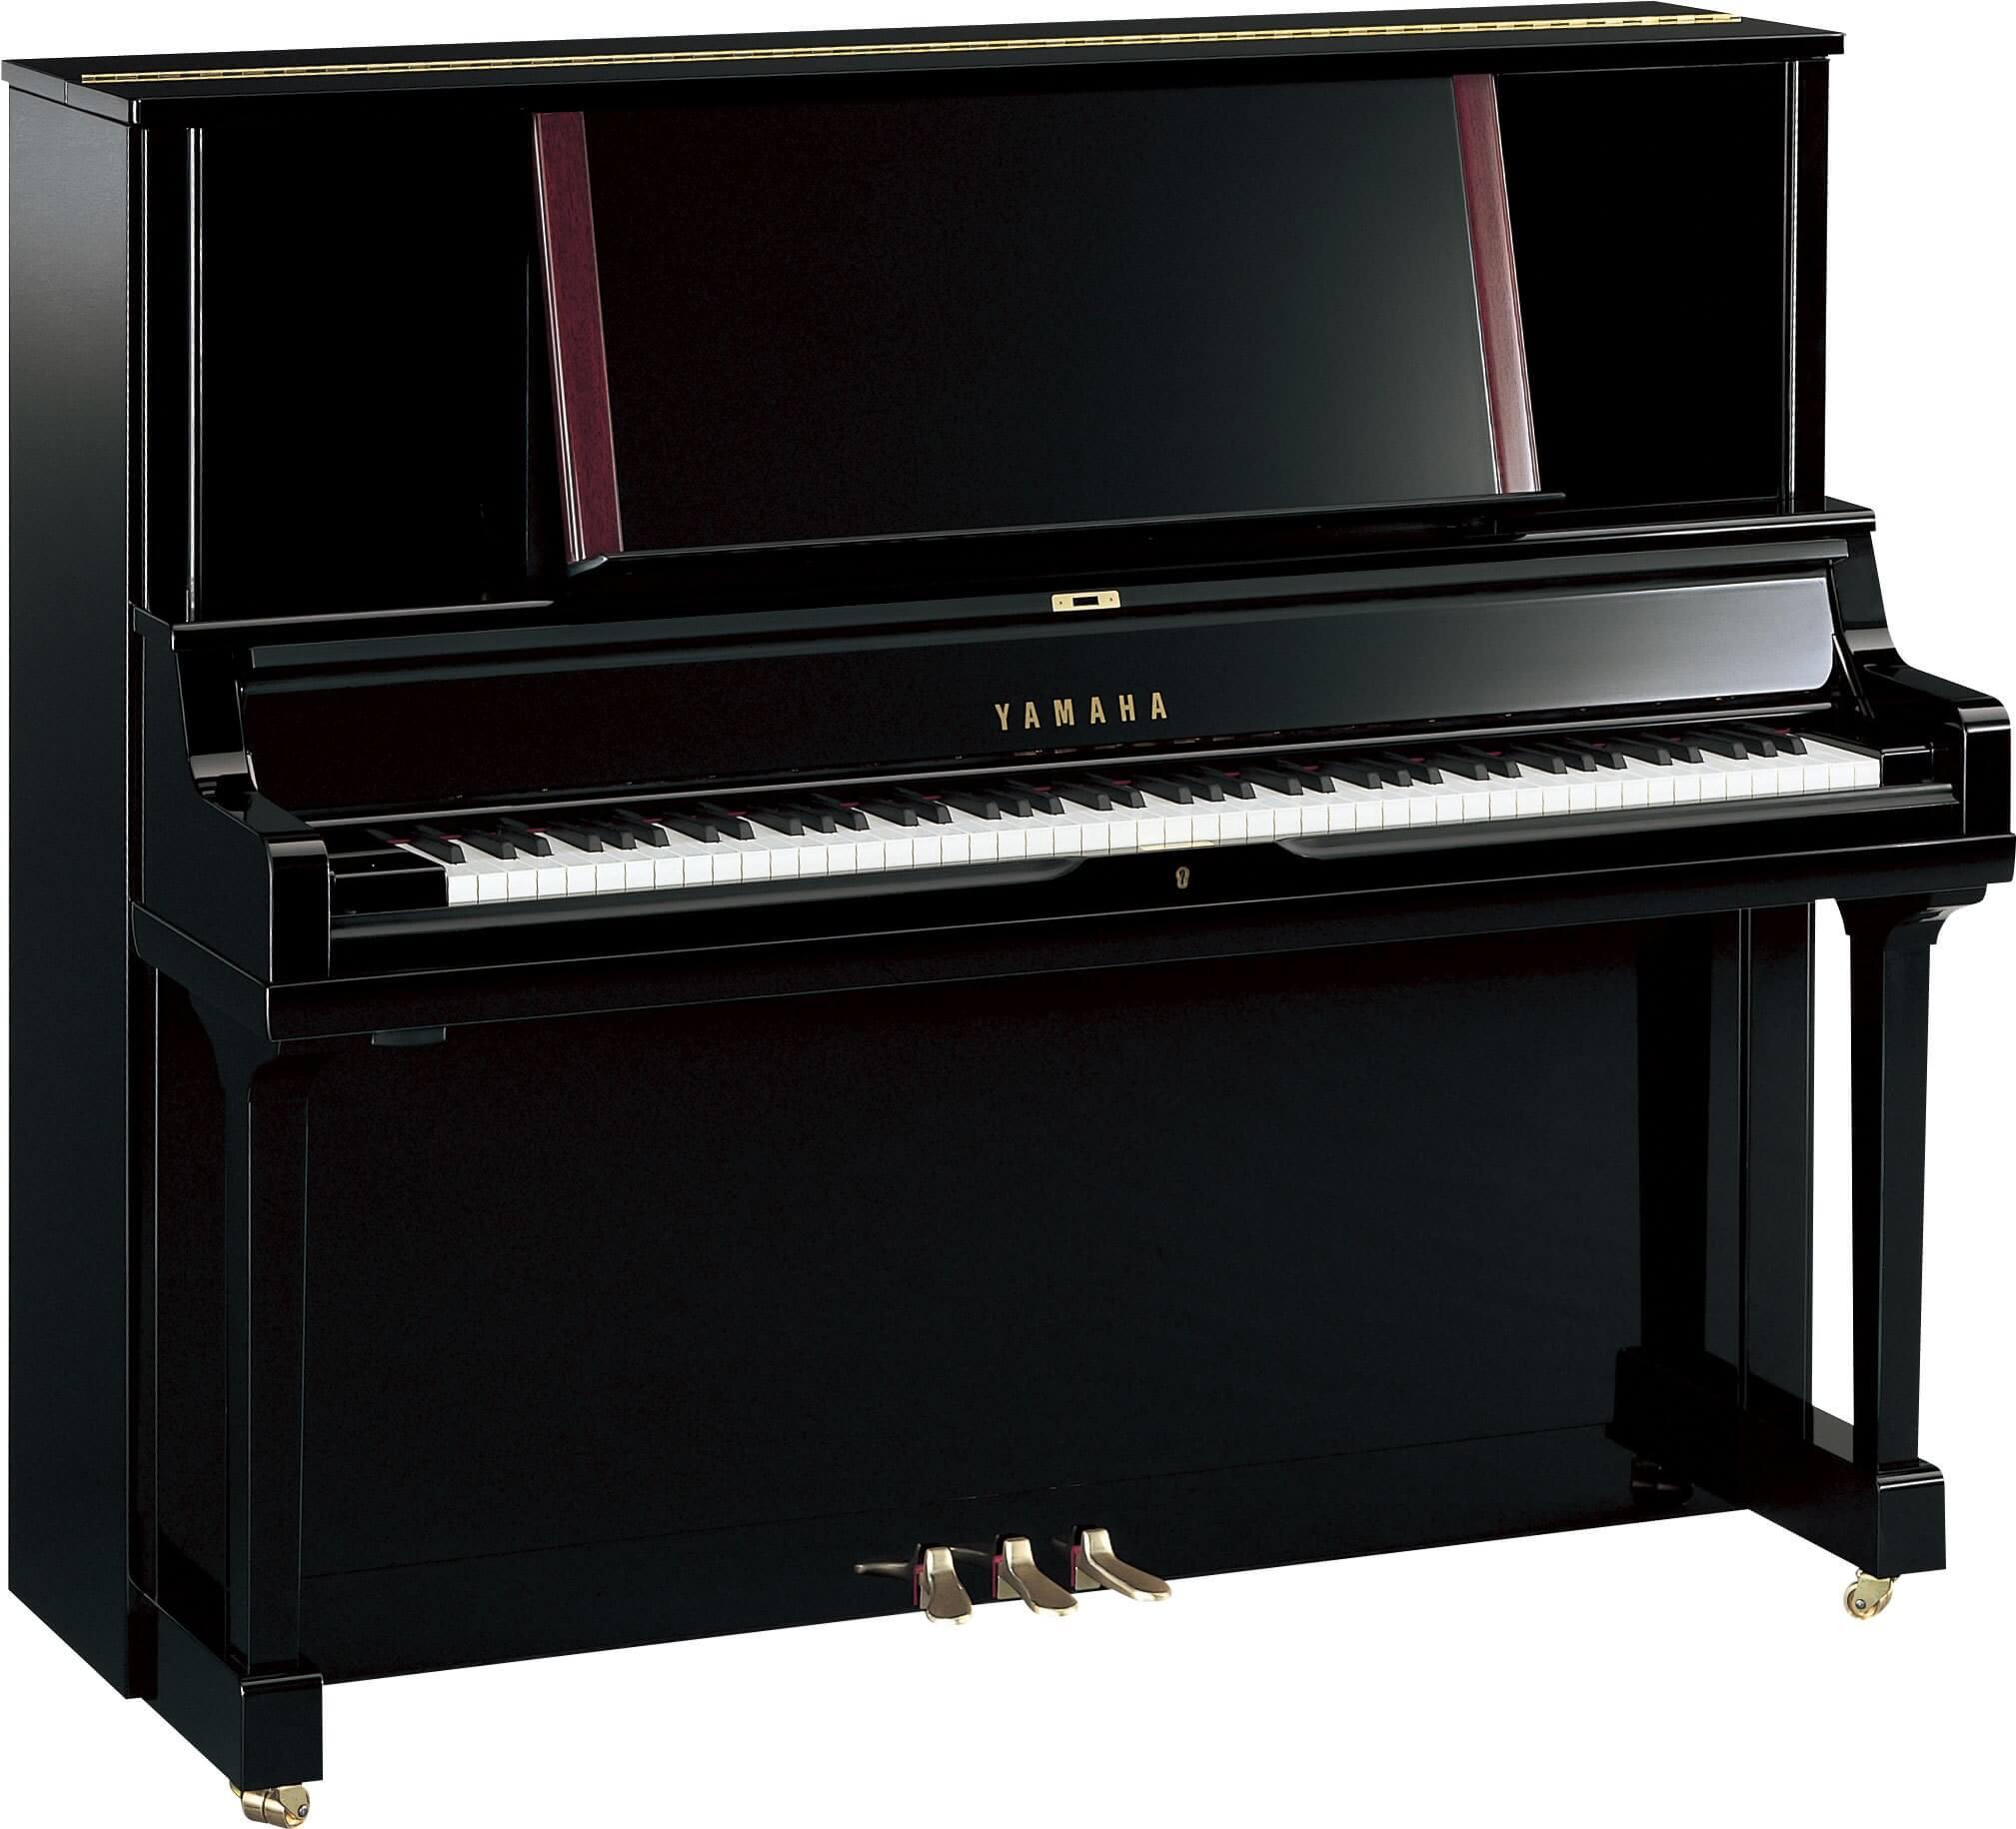 Piano Vertical Yamaha YUS5 Negro Pulido